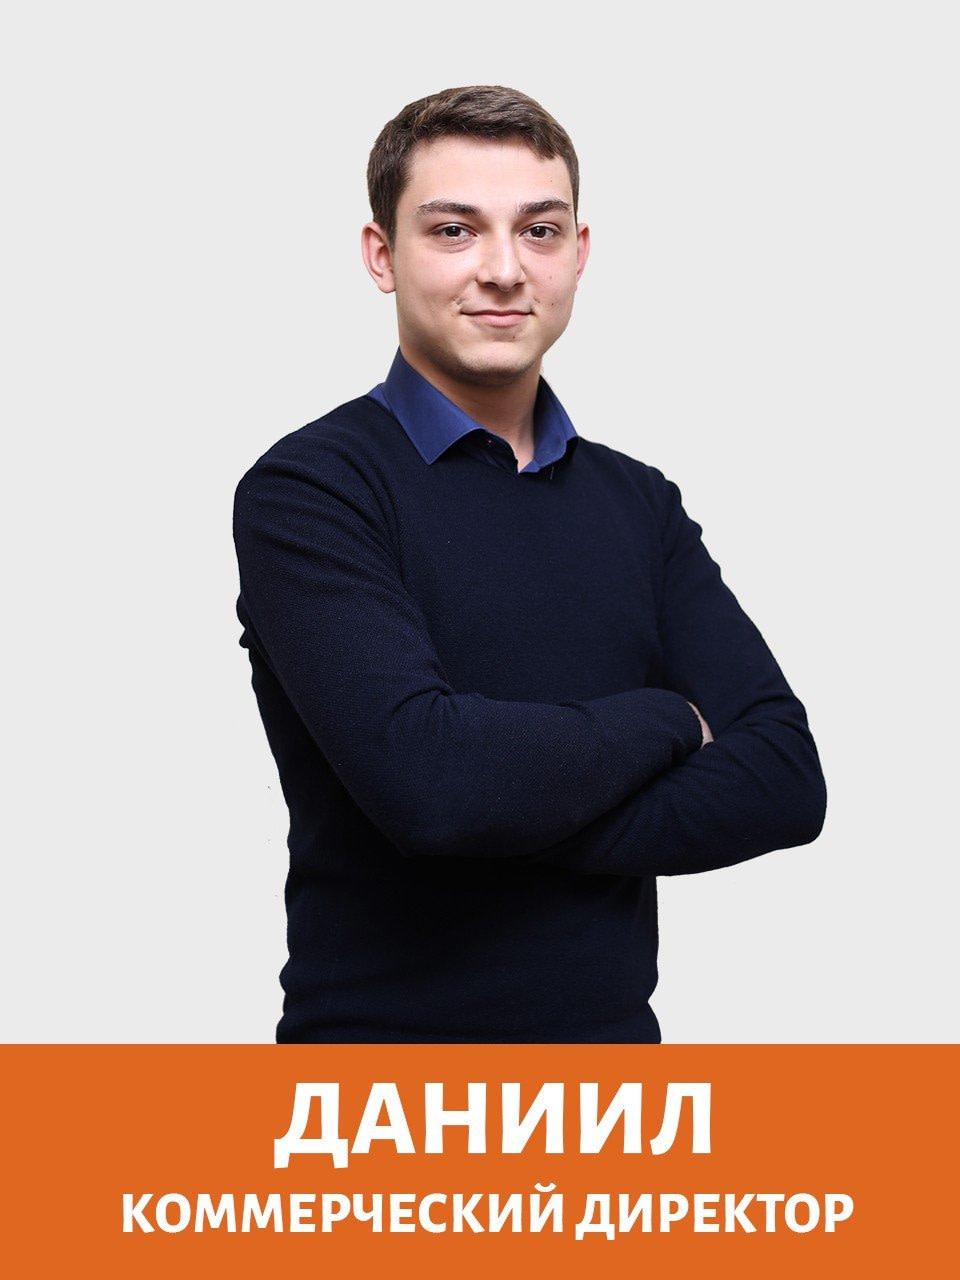 daniil direktor1 - Сайттар жасау